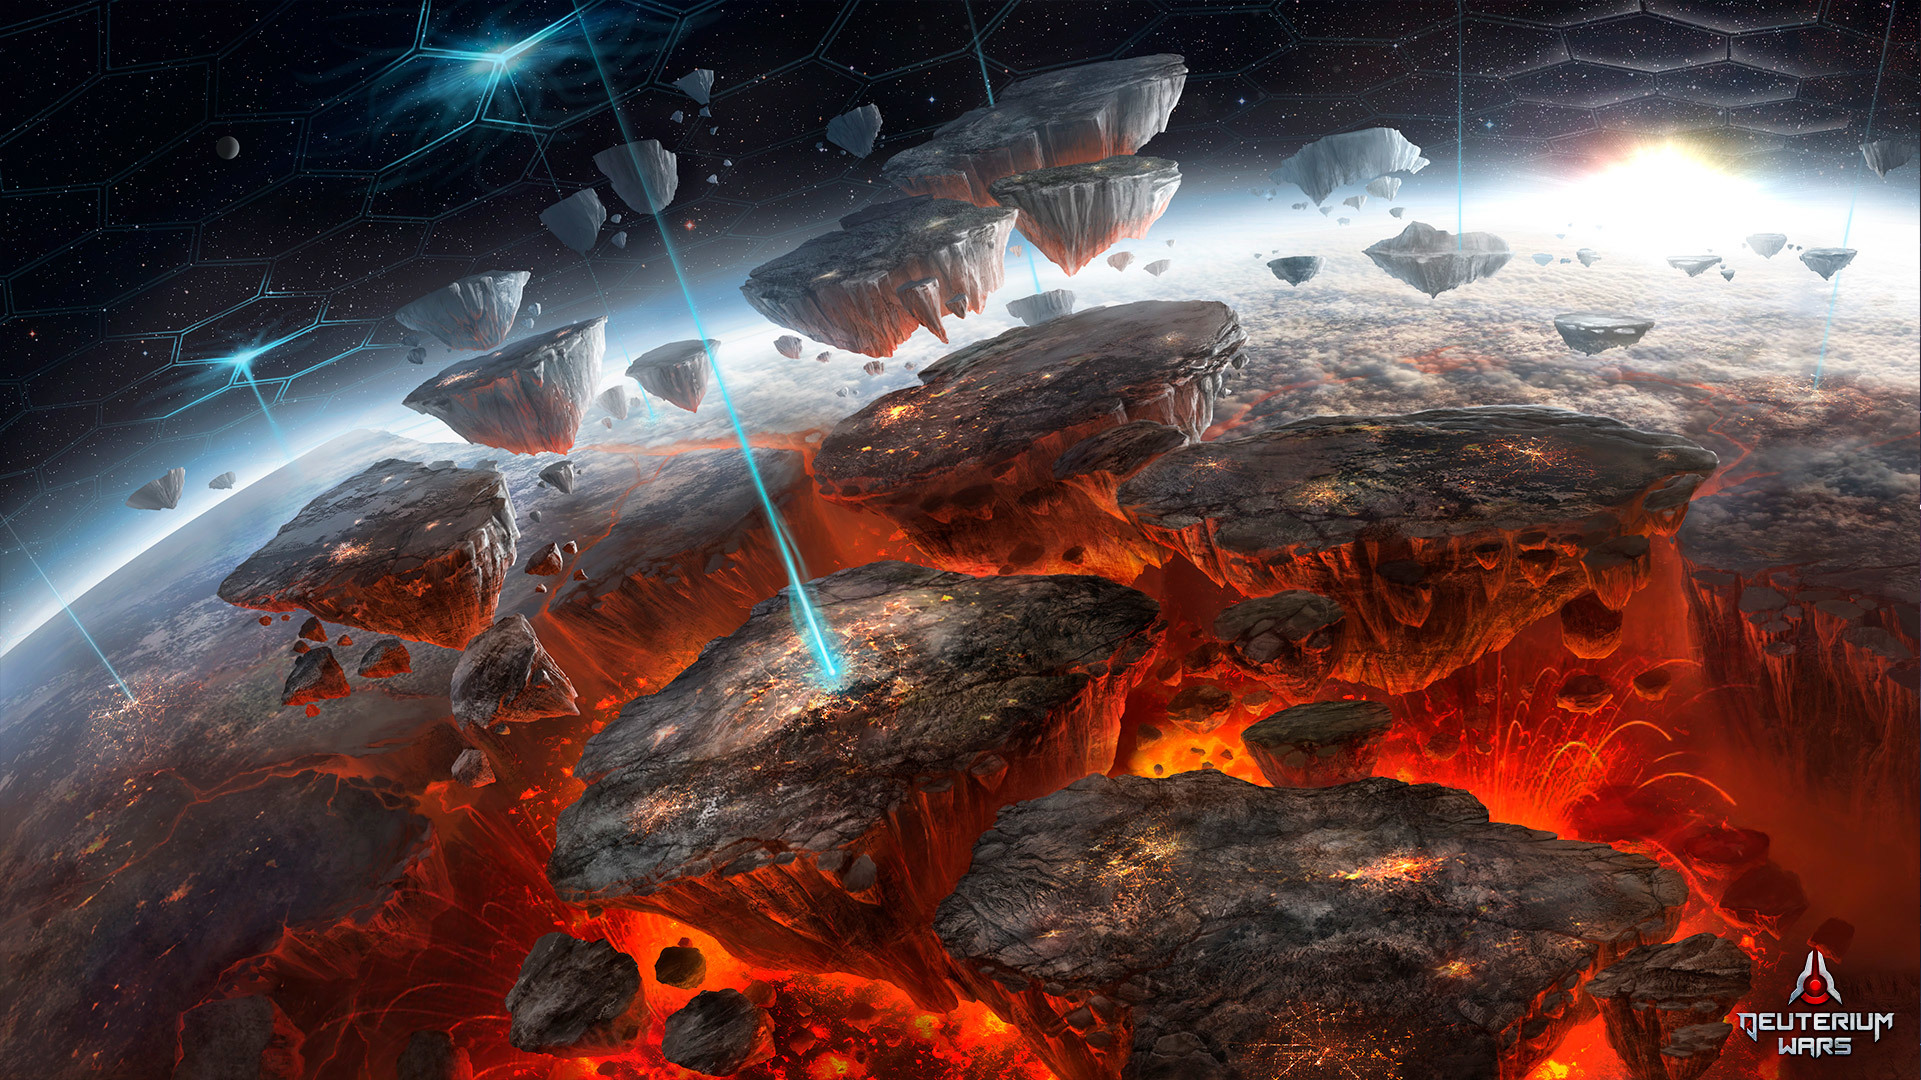 Deuterium Wars :: Planned server maintenance from 17:40 to